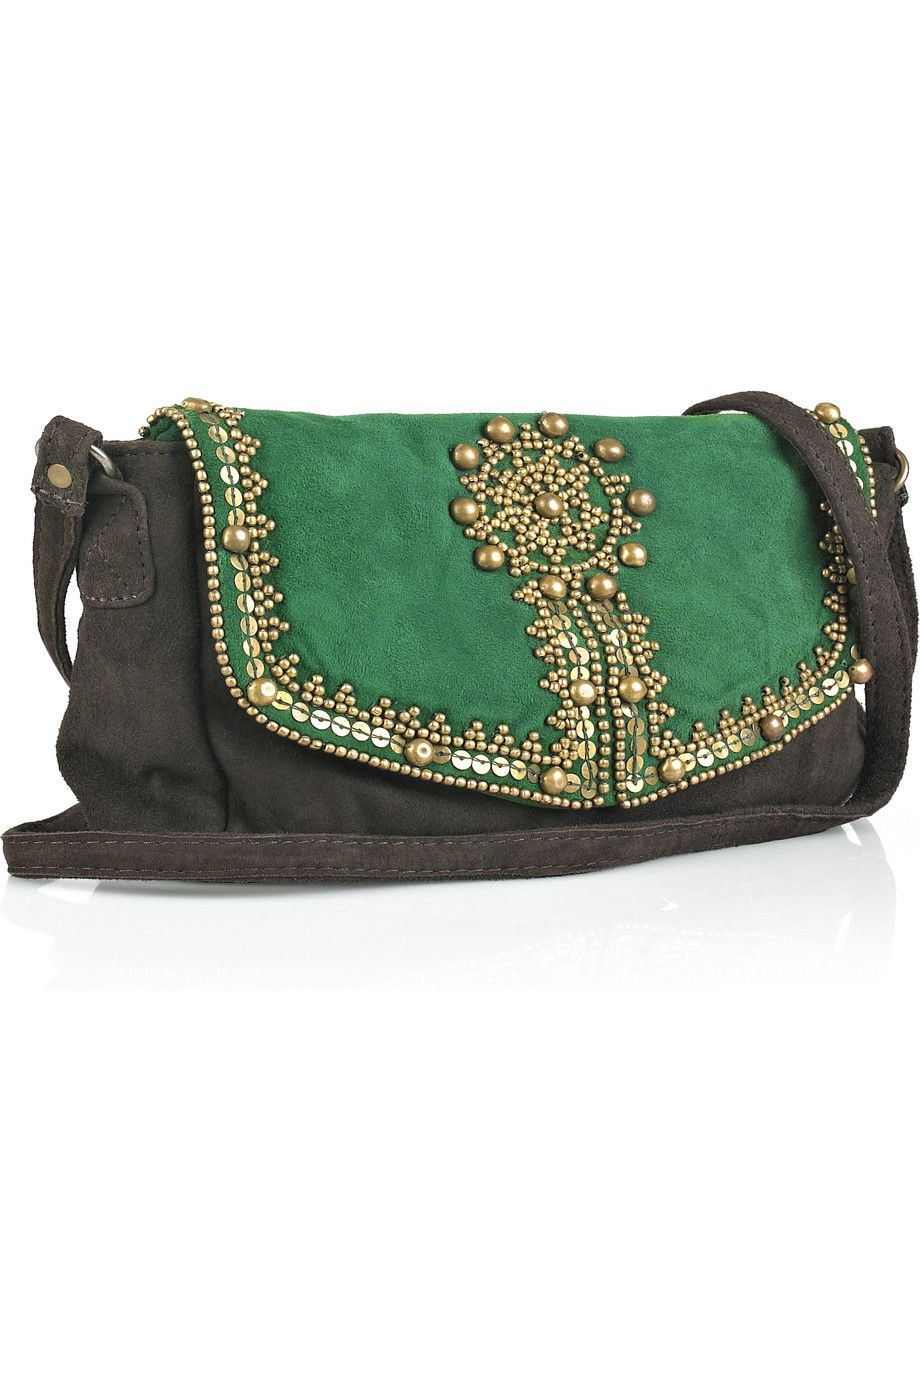 ceebe648d Antik Batik bag, so vintage! Lovin'   Cosas de Ian   Bolsos de ...